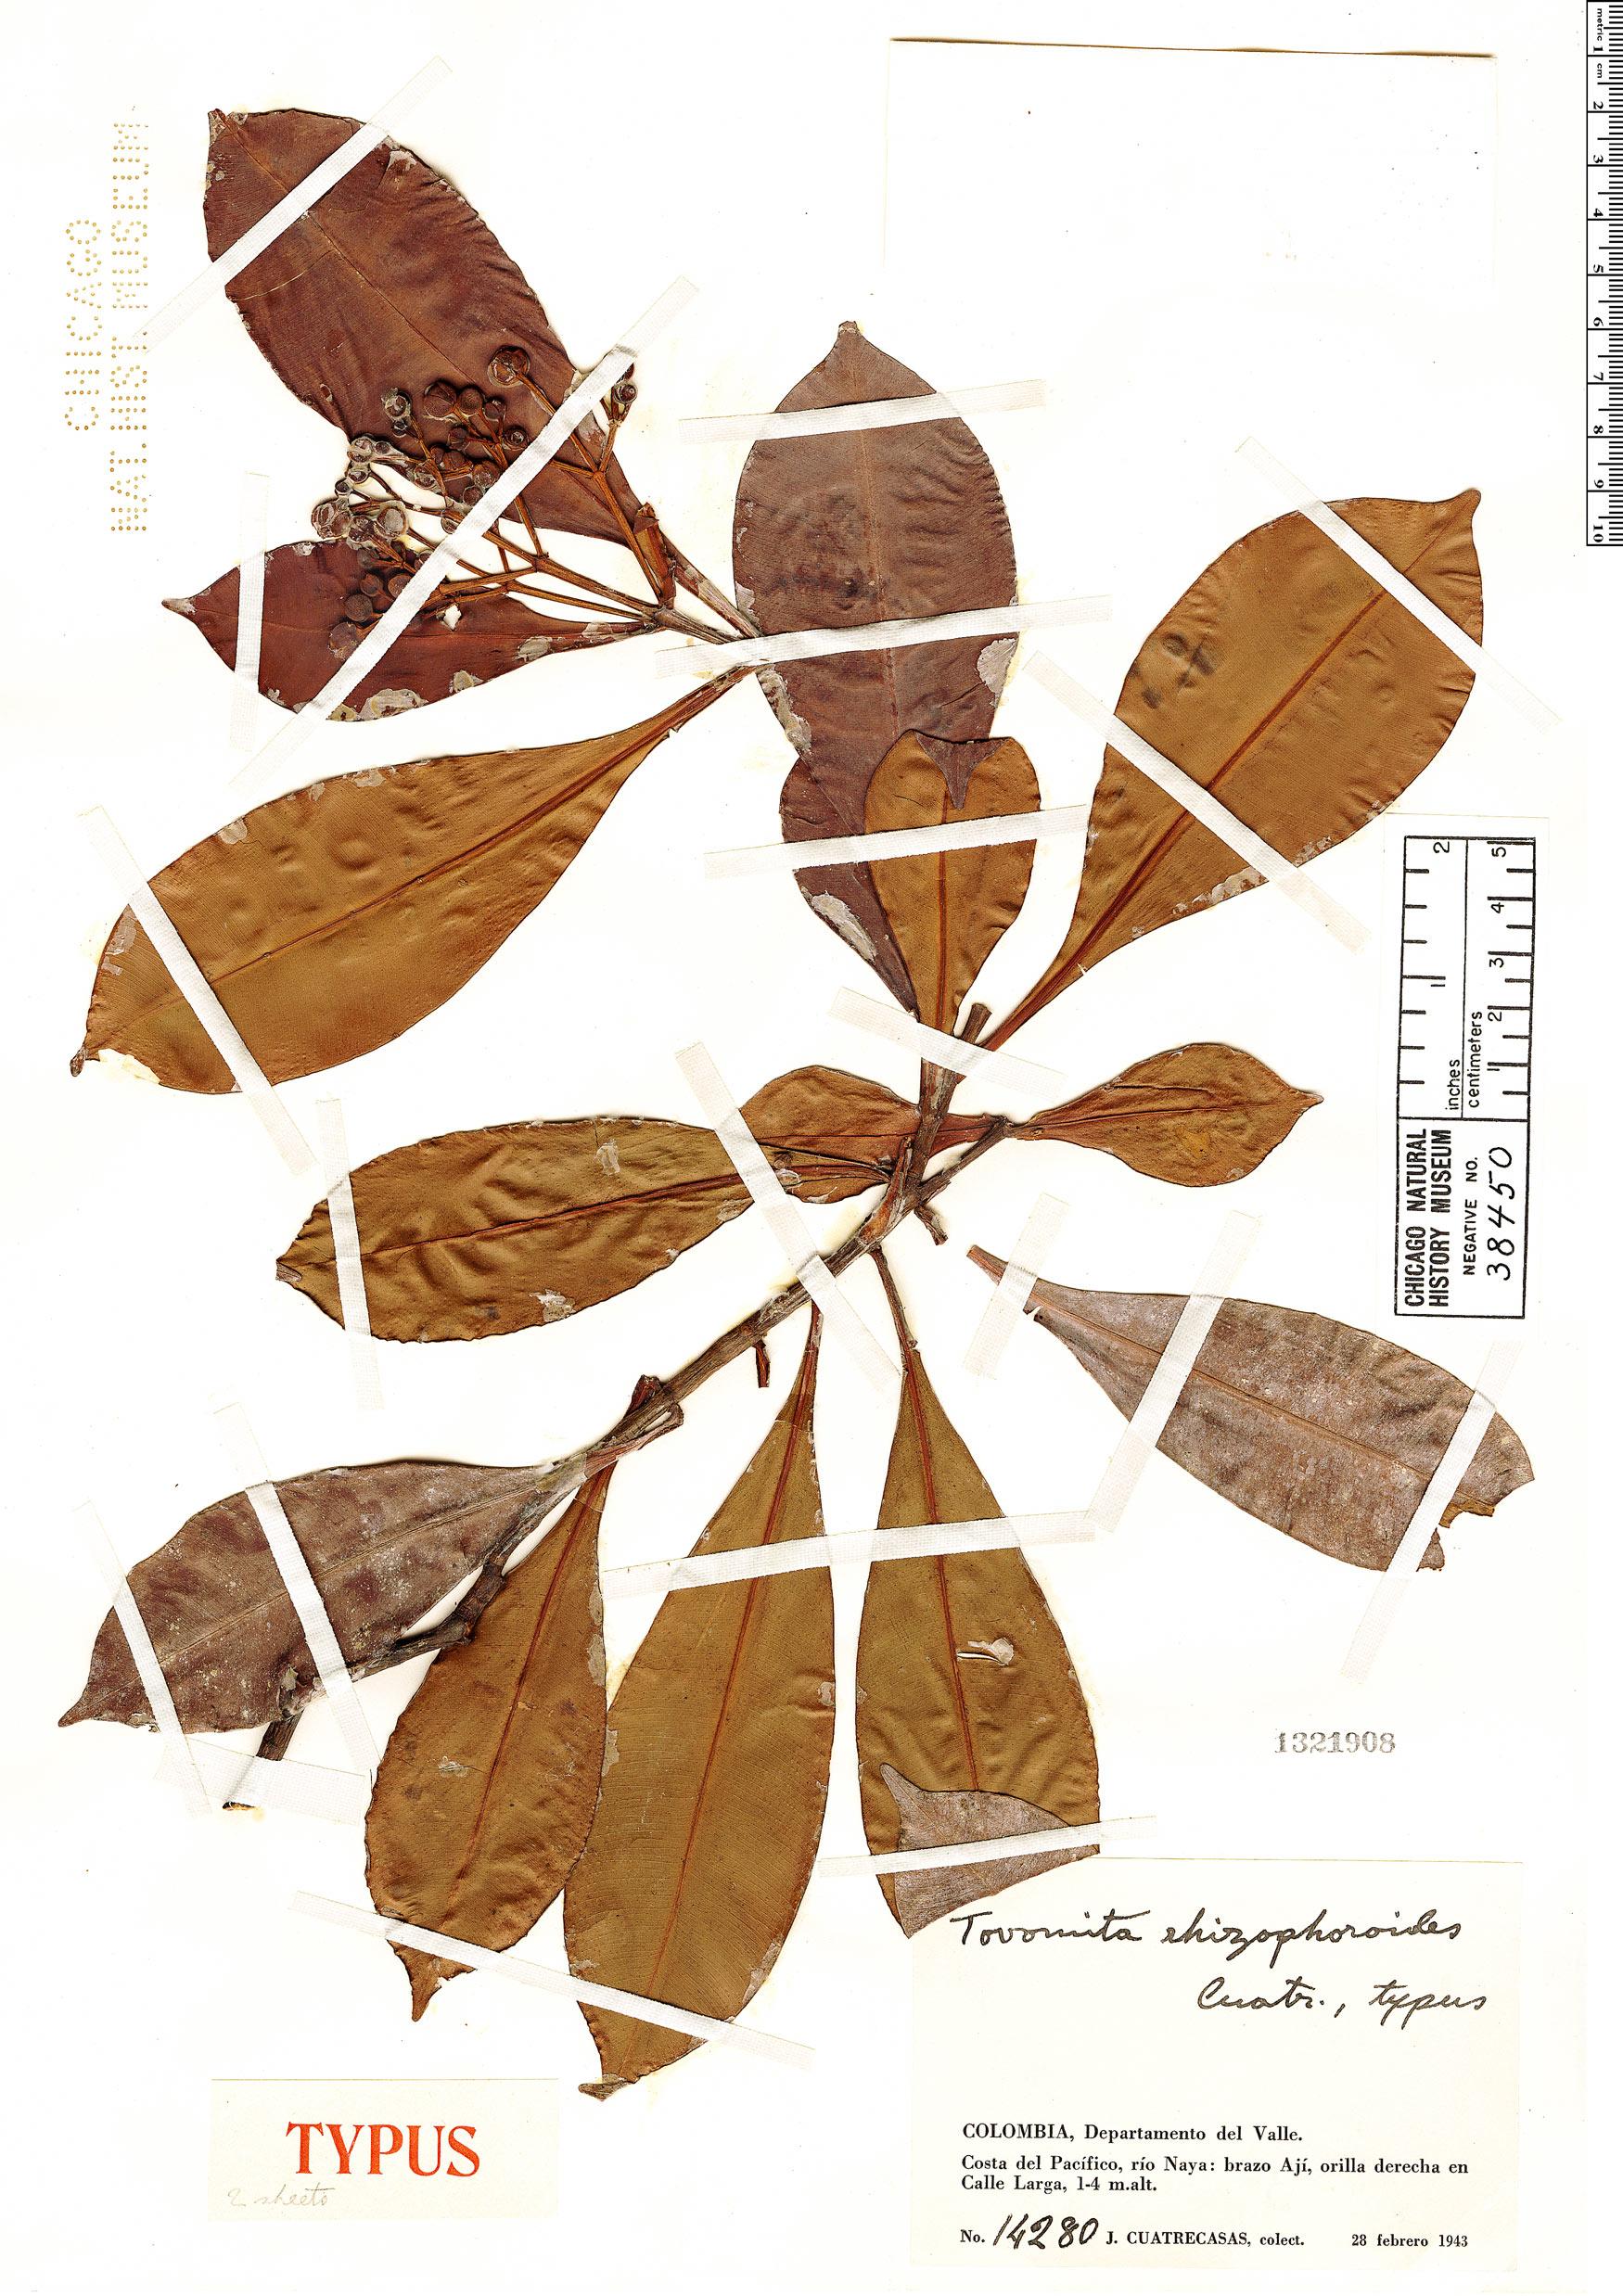 Specimen: Tovomita rhizophoroides